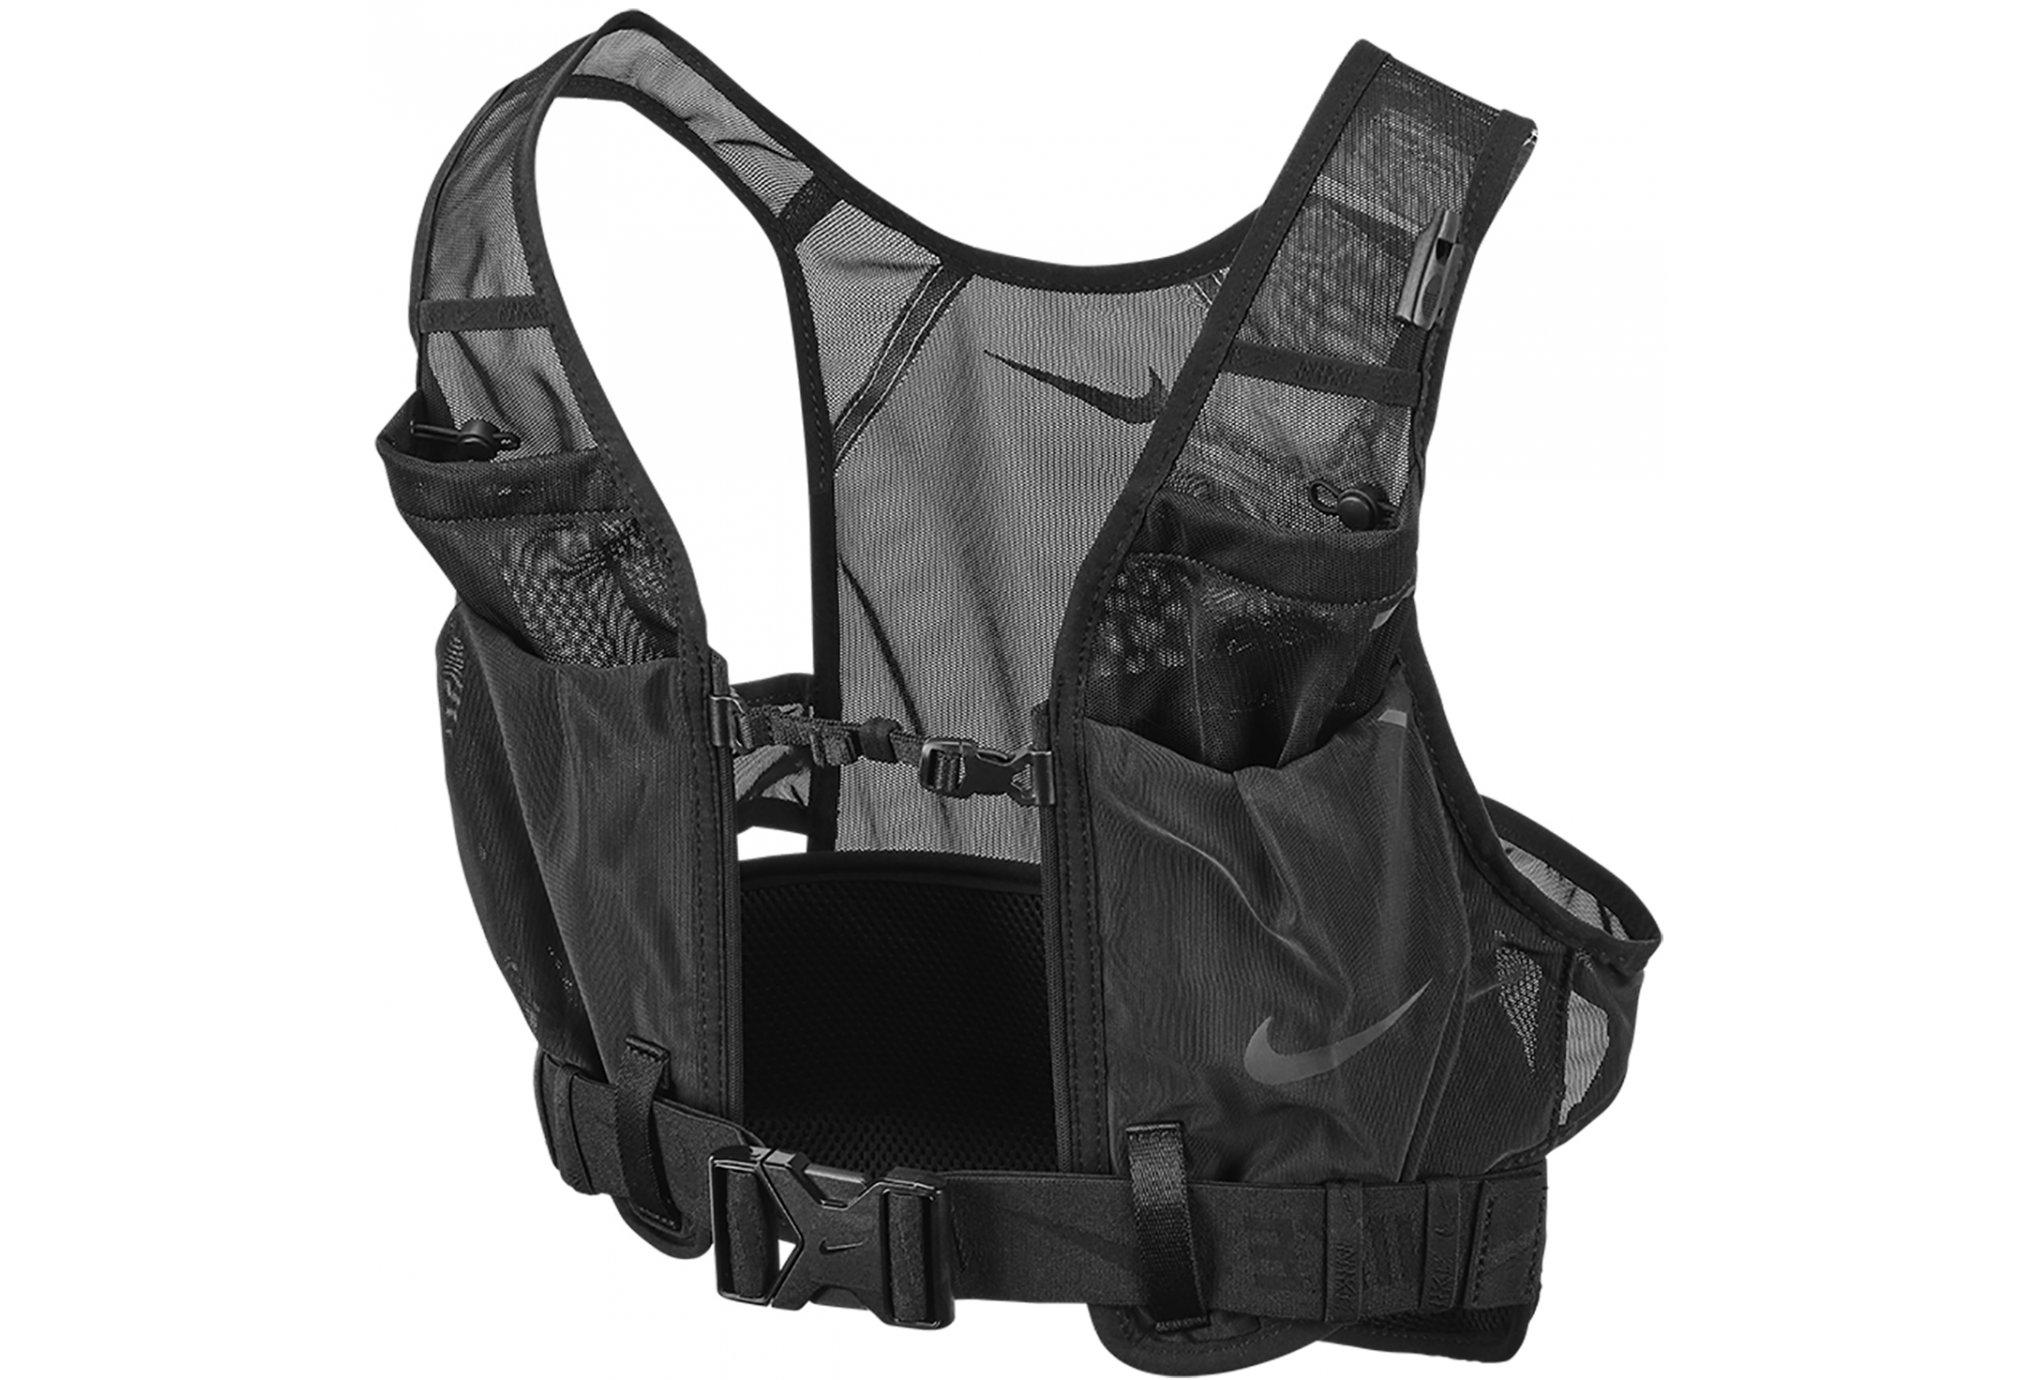 Nike Tranform Vest Pack Sac hydratation / Gourde